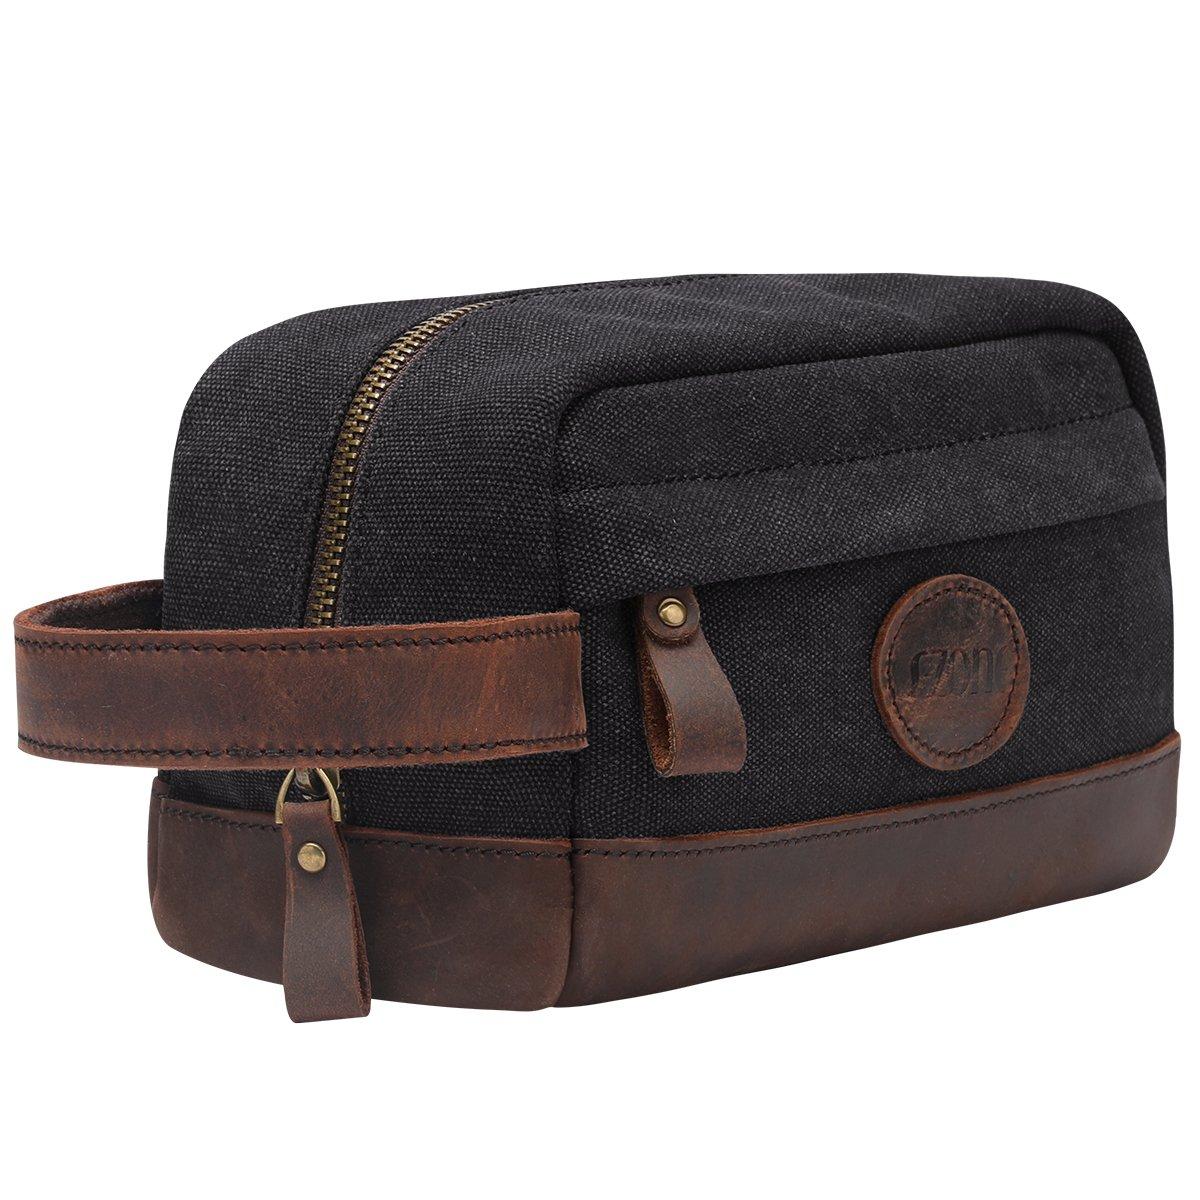 S-ZONE Vintage Leather Canvas Men Toiletry Bag Shaving Dopp Case Dopp Kit Makeup Bag Groomsmen Gifts S-ZONE D04V826C